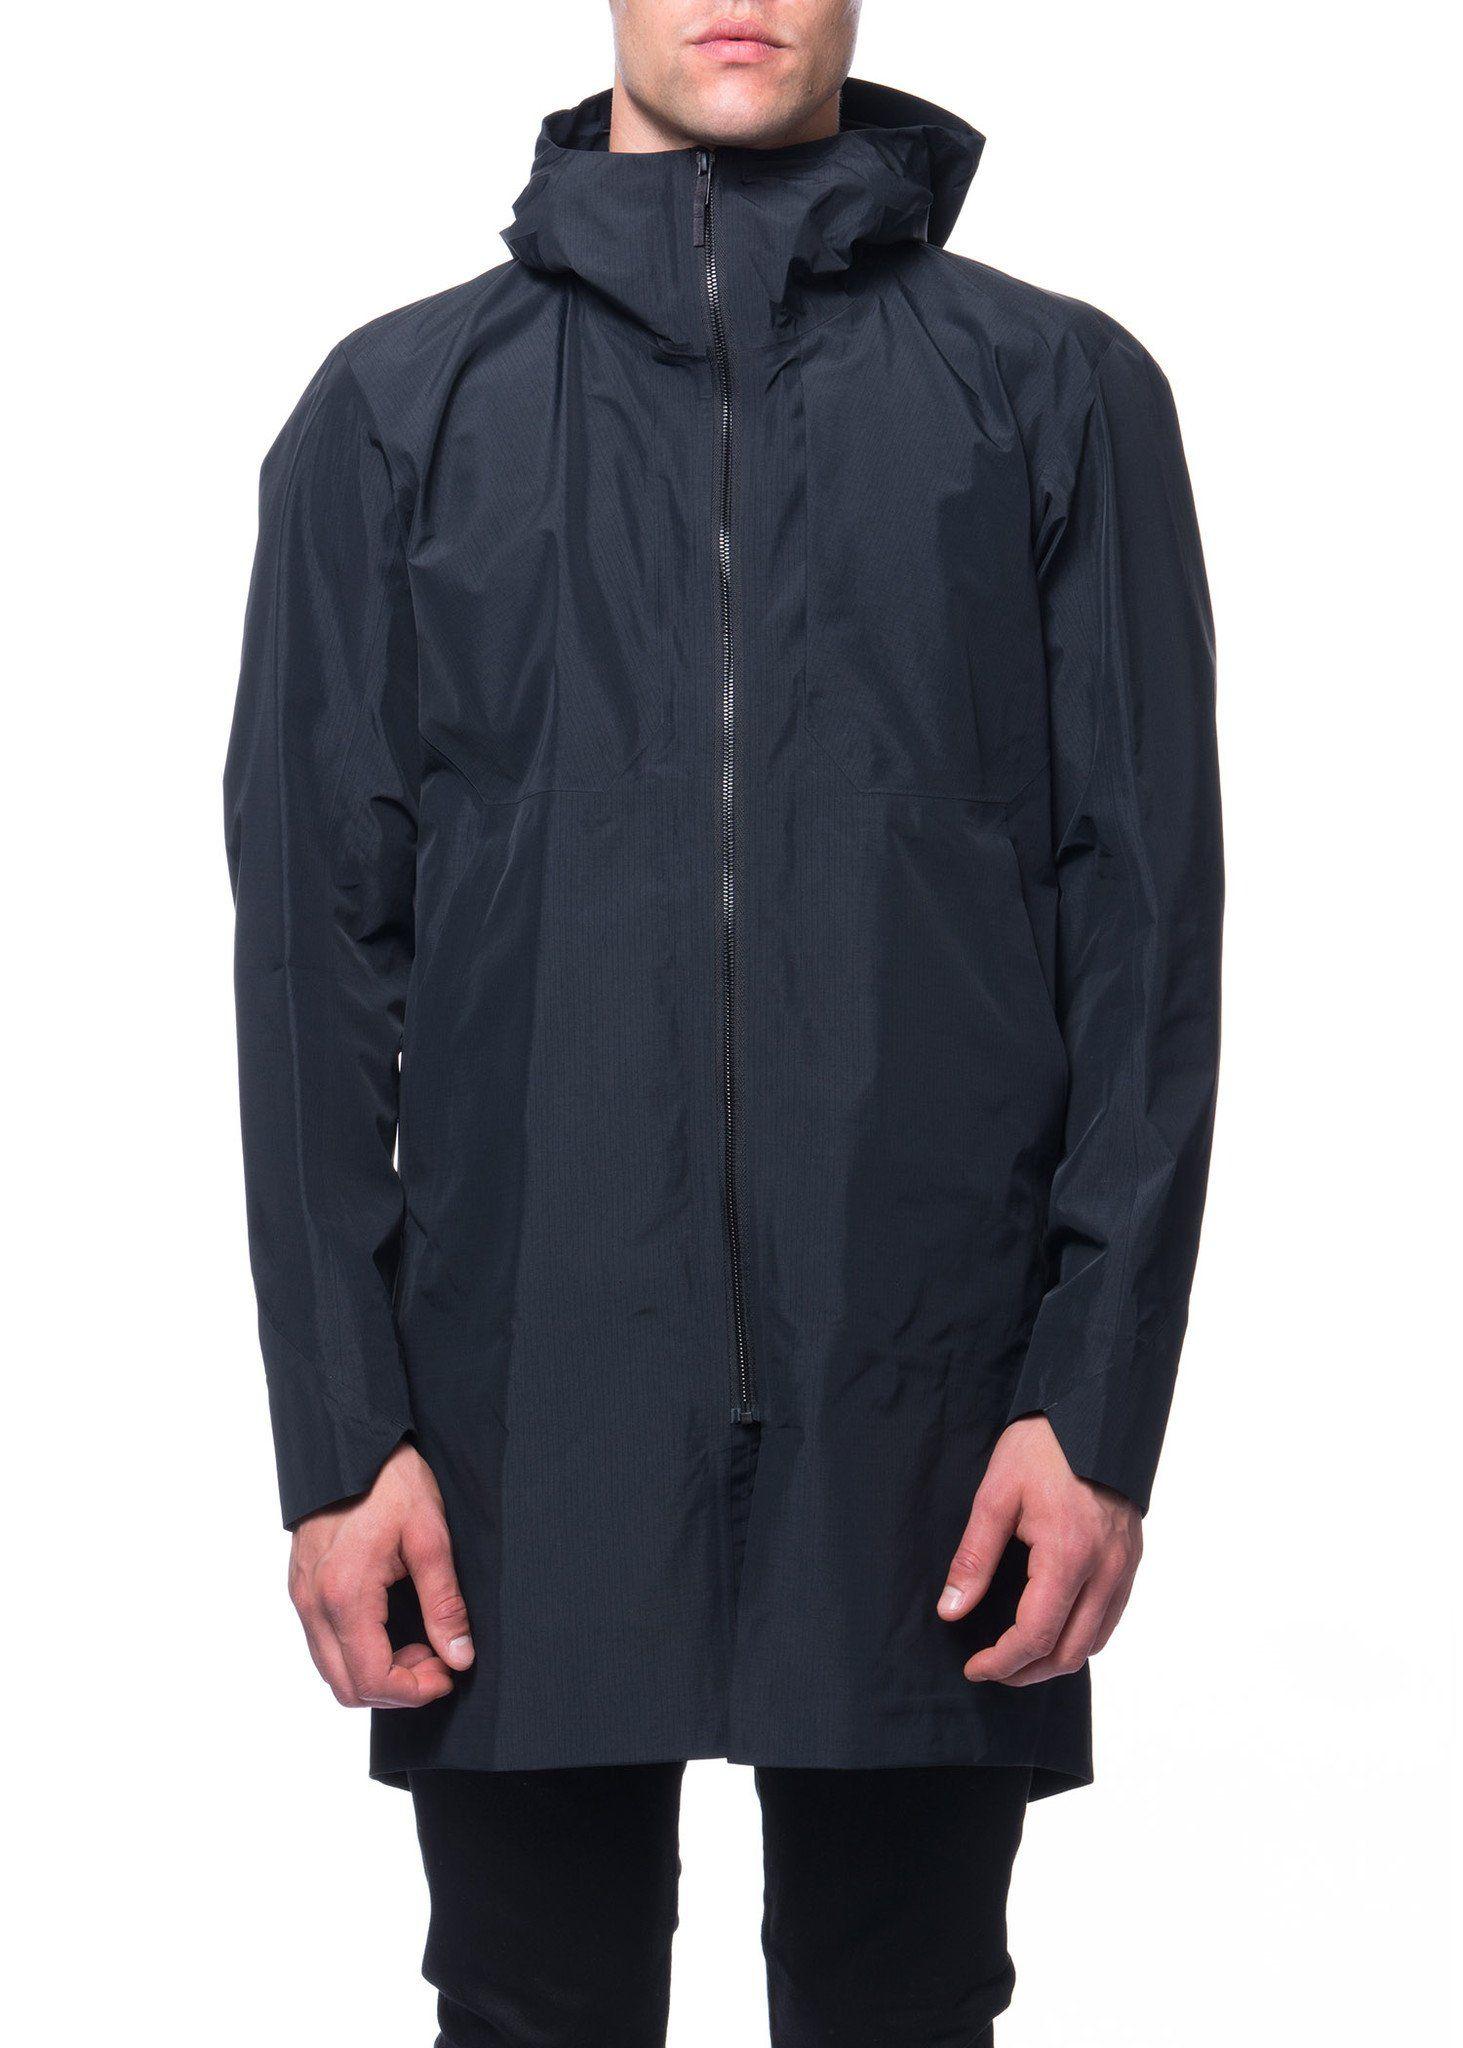 b2eb95f300 Arc'teryx Veilance - FW16 - Menswear // Black Monitor coat without  insulation